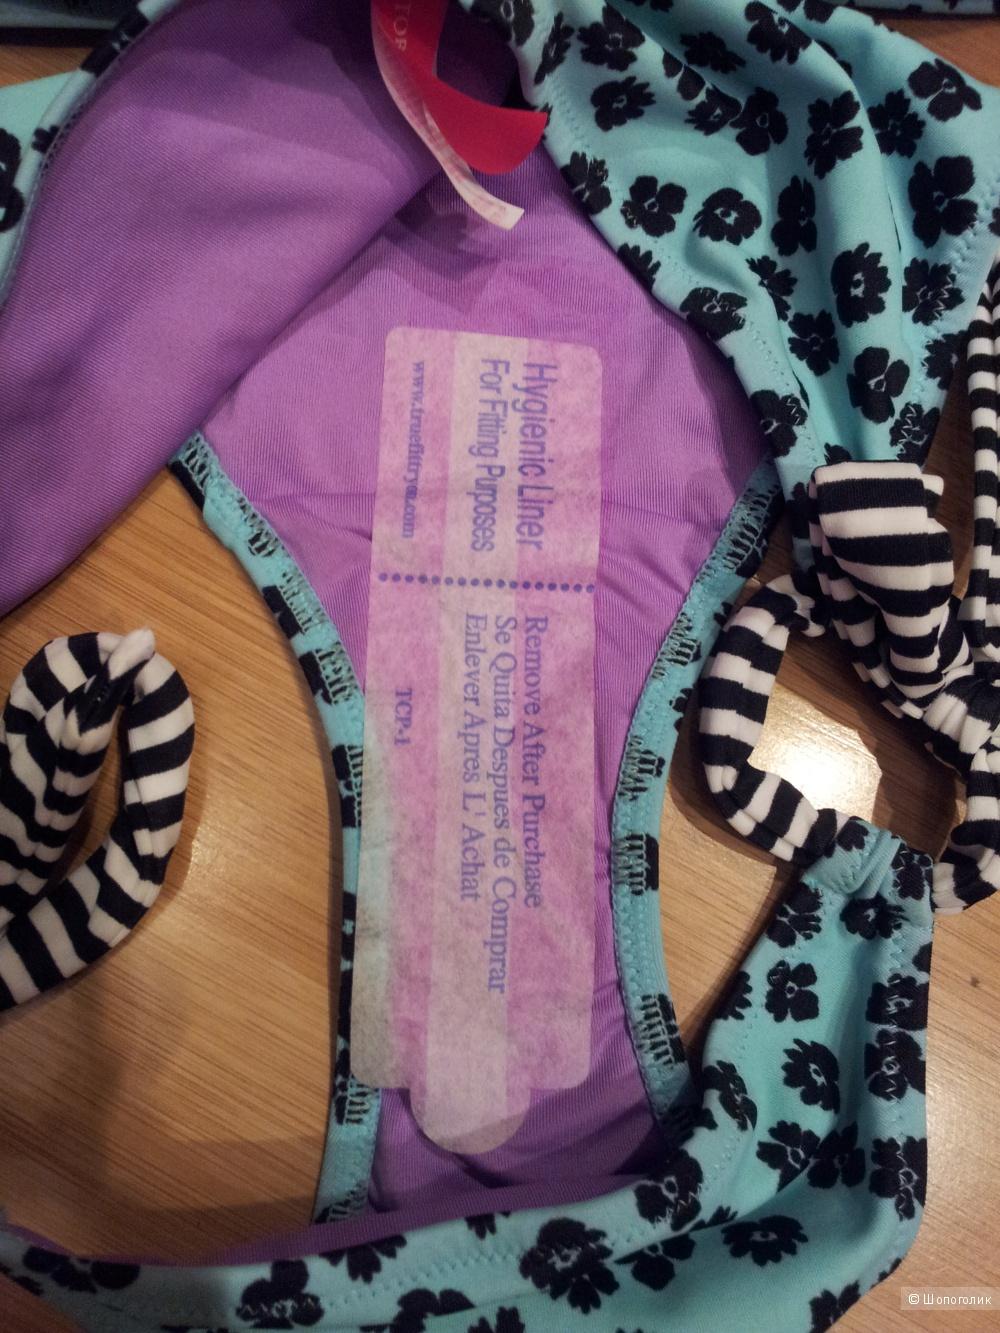 Купальник Victoria's Secret Gorgeous Push-up Halter размер 34B и XS новый